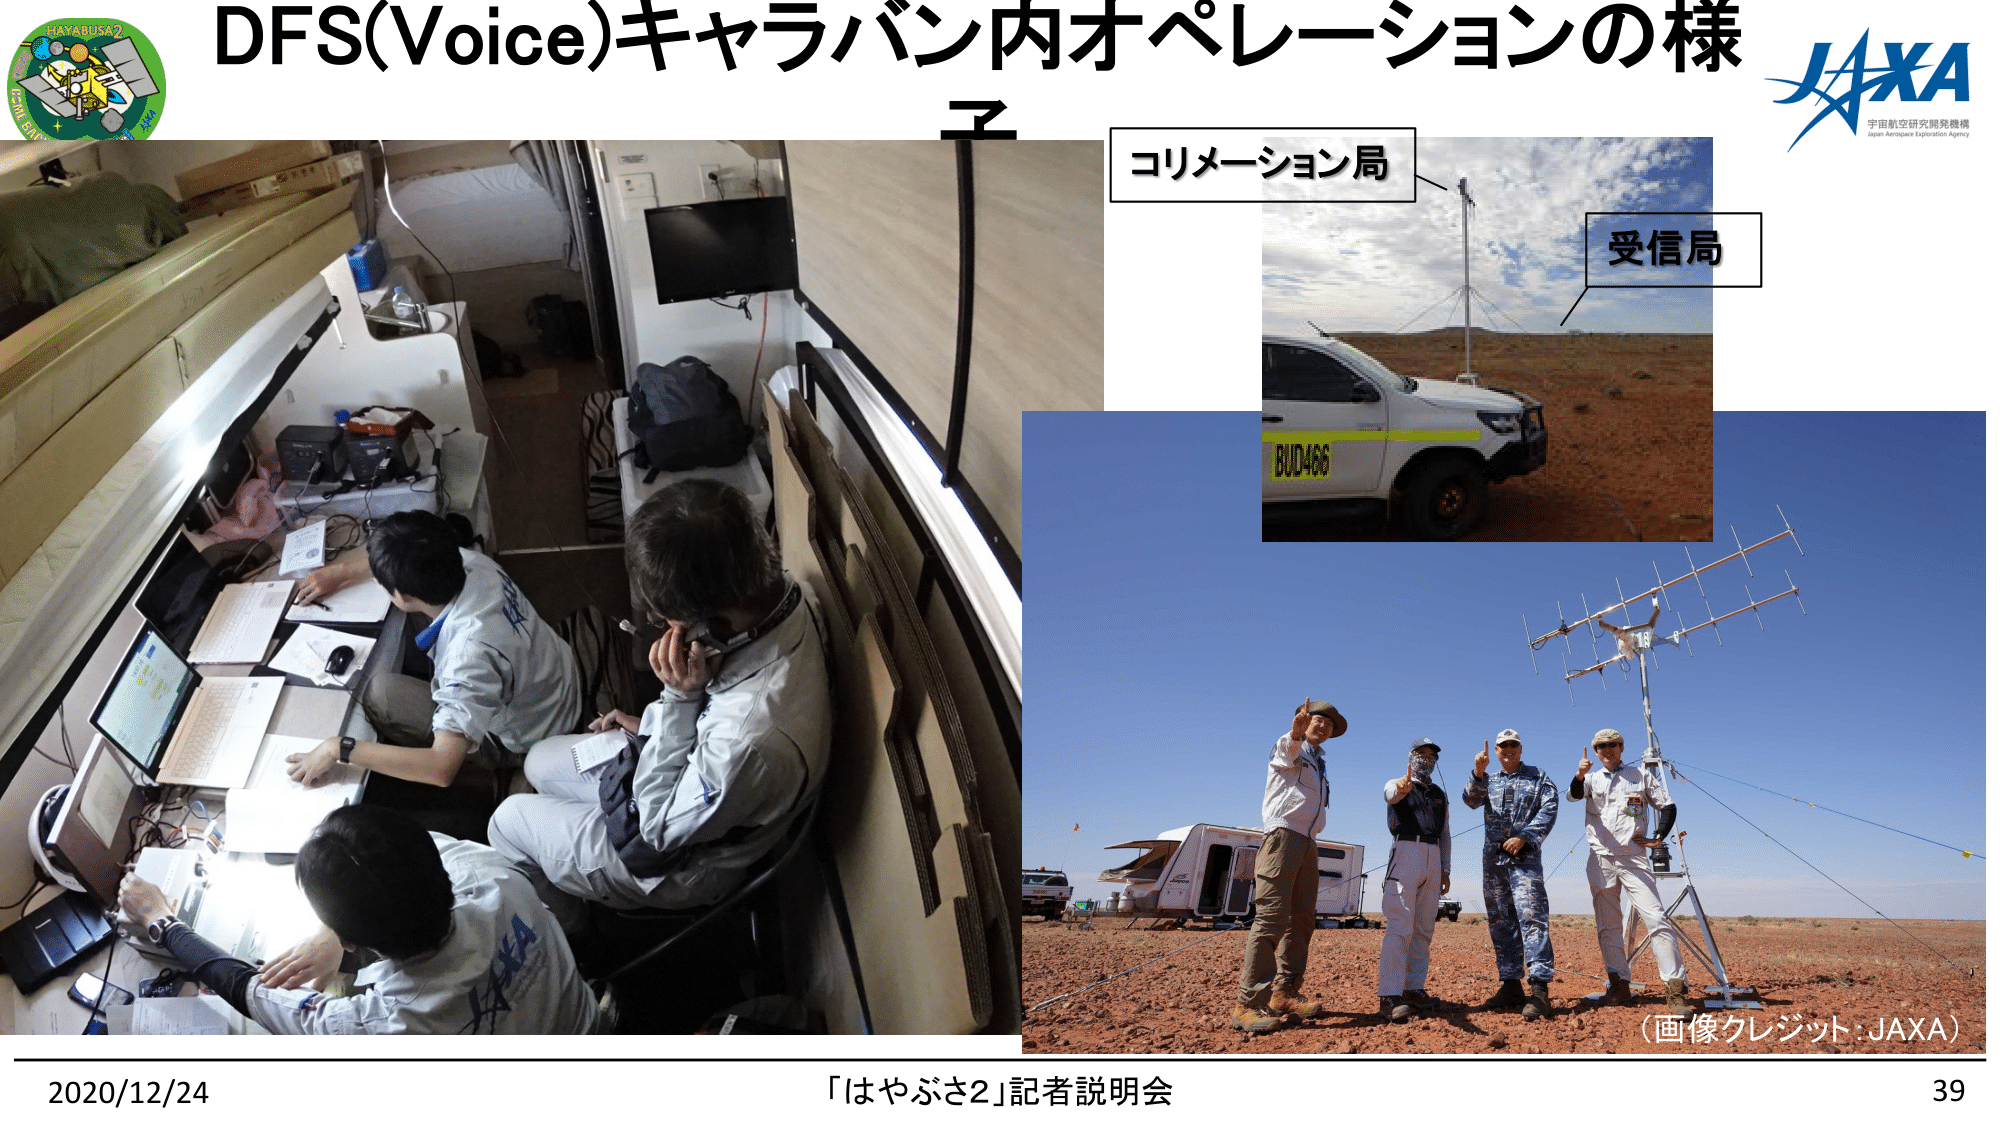 f:id:Imamura:20201224135502p:plain